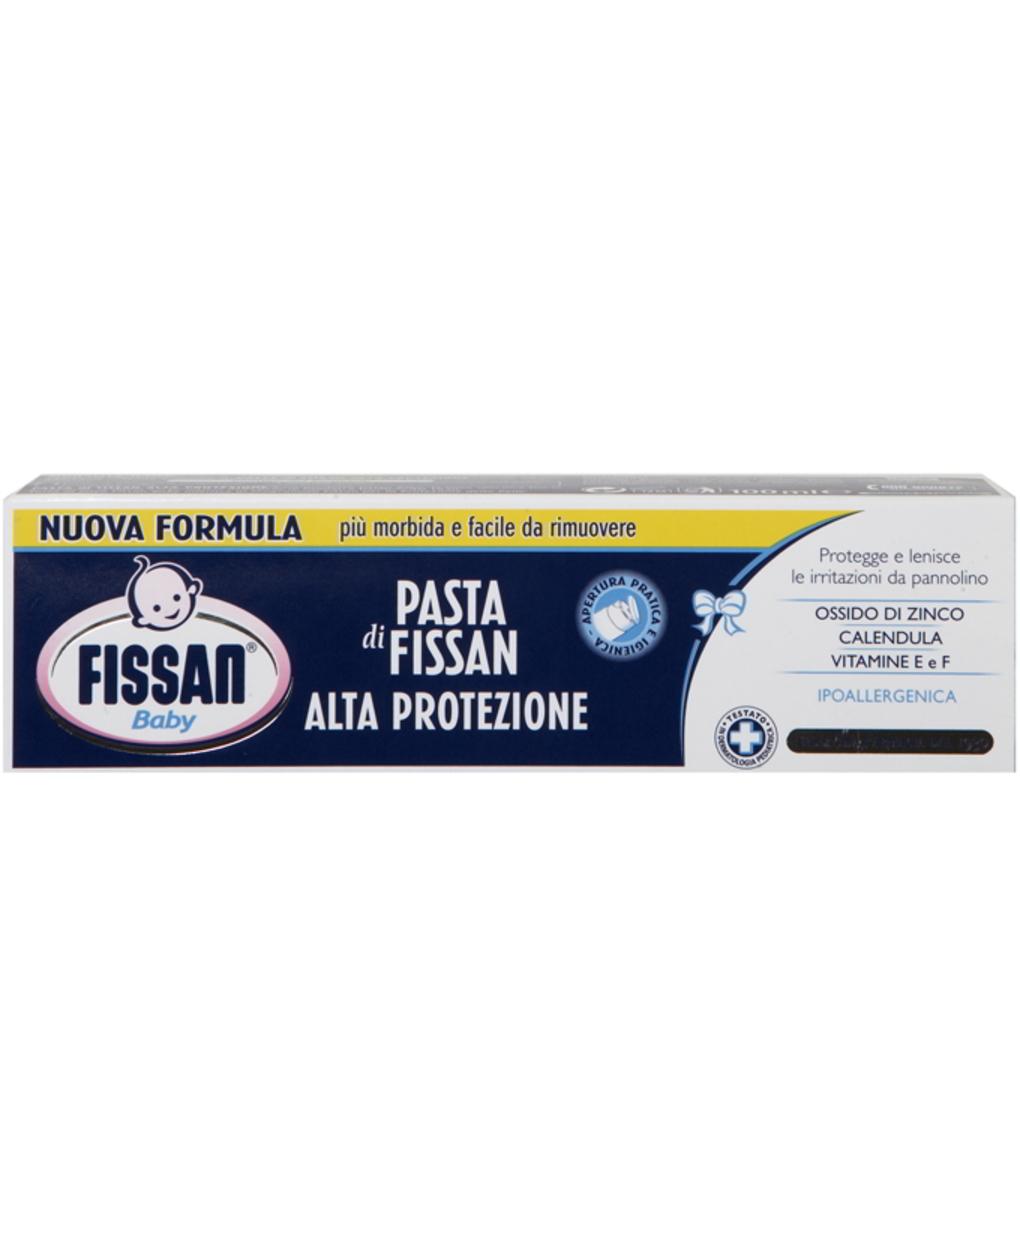 Nova fórmula de pasta de alta proteção - Fissan